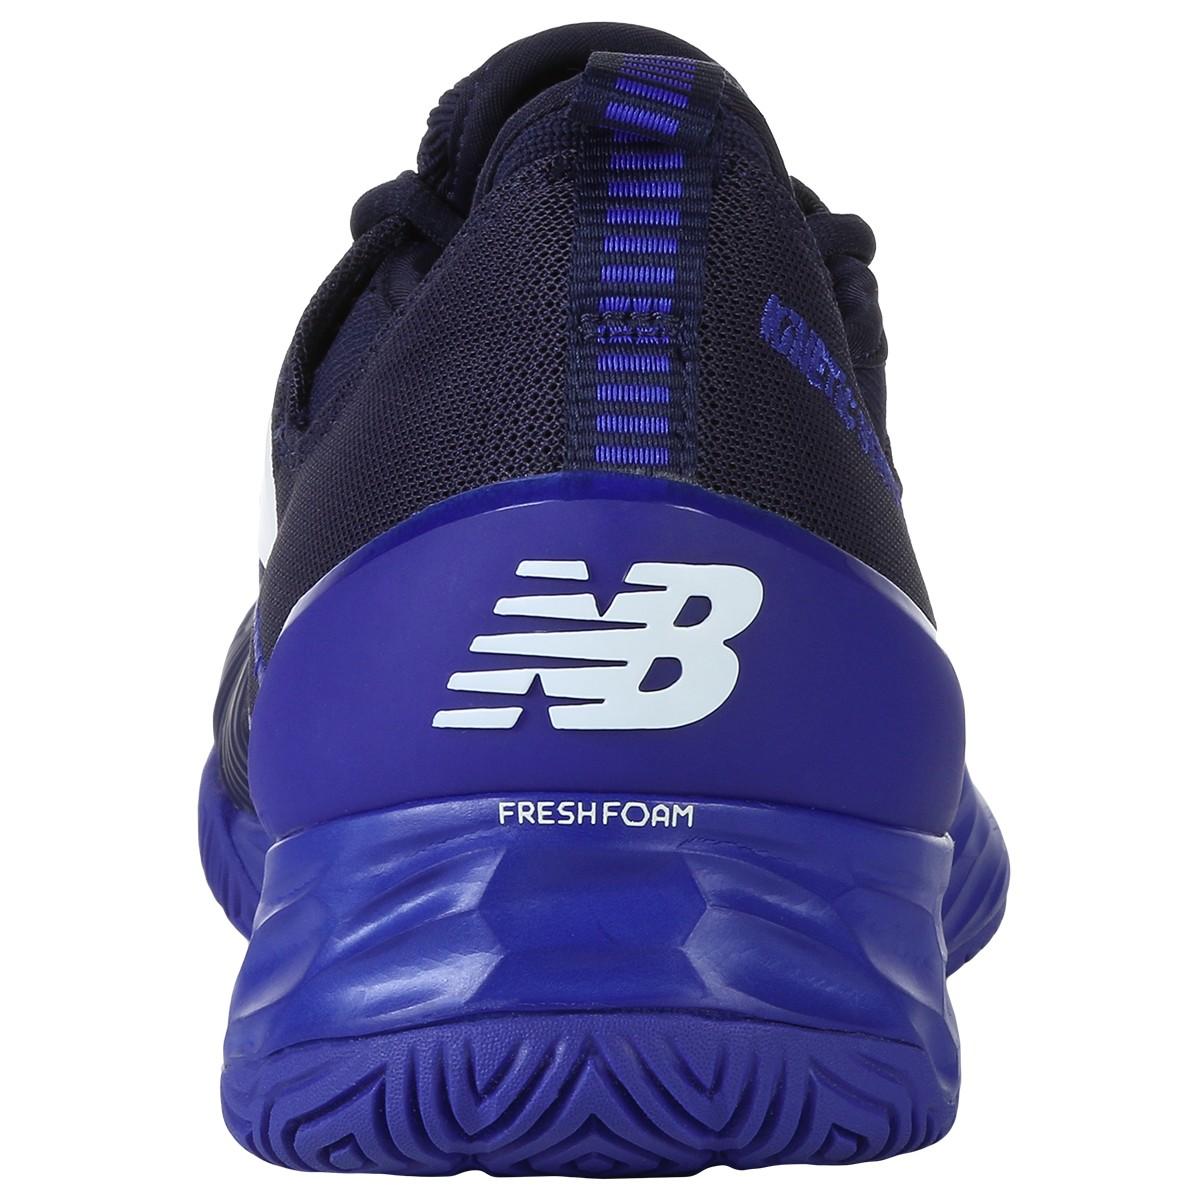 Foam Surfaces Raonic Lav Chaussures Balance Fresh Toutes New 5L4Rjq3A